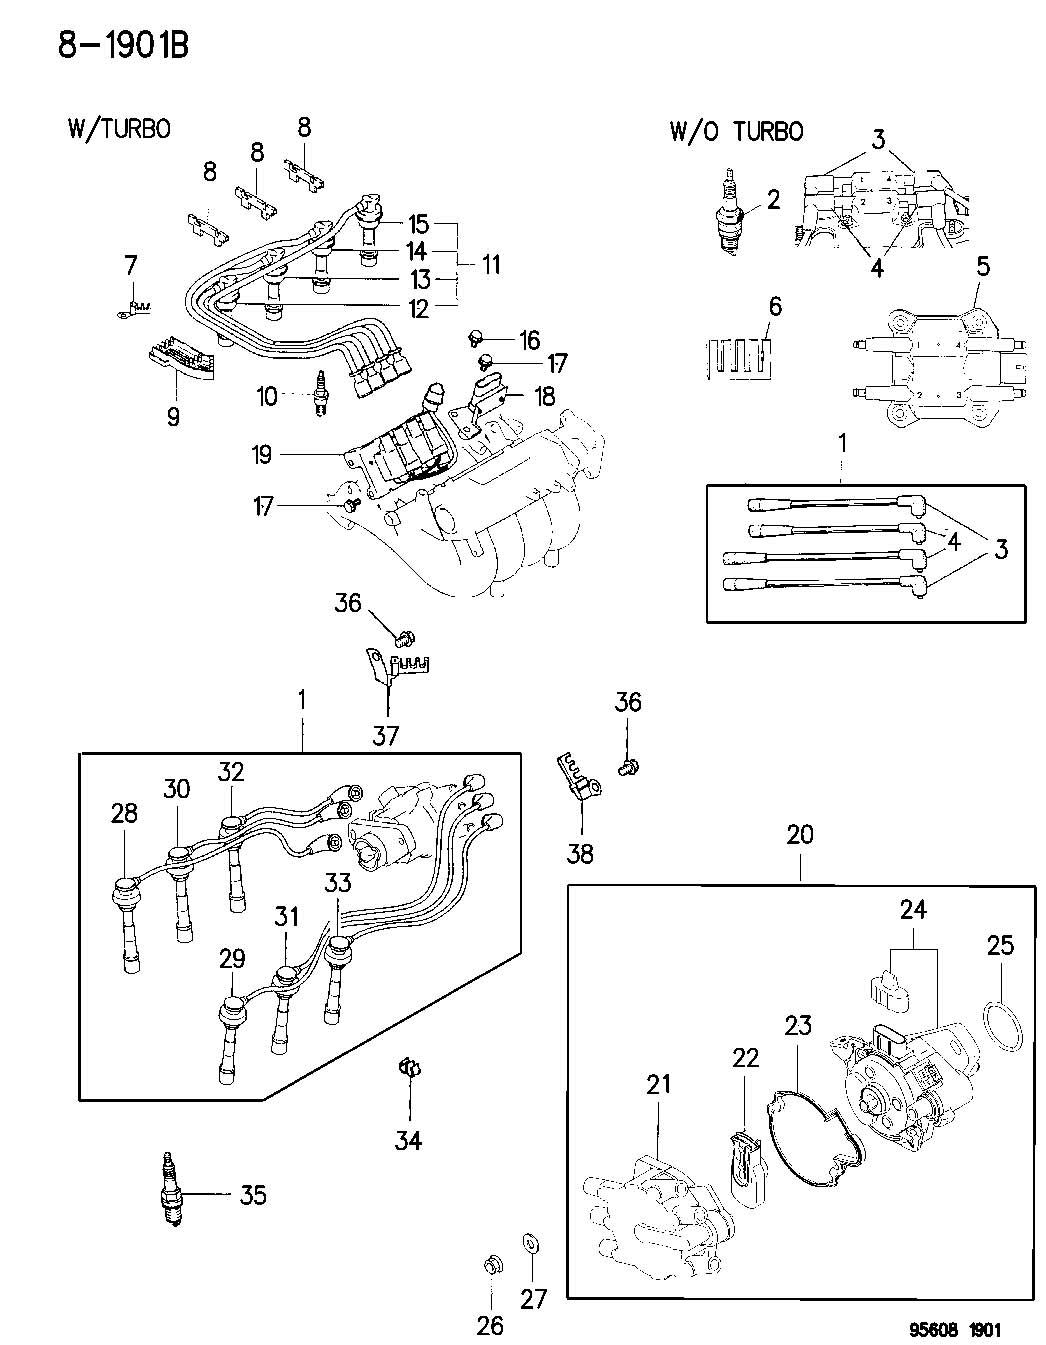 00000FU7  Galant Wiring Diagram on traverse wiring diagram, model wiring diagram, impreza wiring diagram, lesabre wiring diagram, matrix wiring diagram, evo wiring diagram, regal wiring diagram, van wiring diagram, g6 wiring diagram, armada wiring diagram, es 350 wiring diagram, legacy wiring diagram, yukon wiring diagram, avalon wiring diagram, forester wiring diagram, celica wiring diagram, challenger wiring diagram, fusion wiring diagram, mighty max wiring diagram, versa wiring diagram,